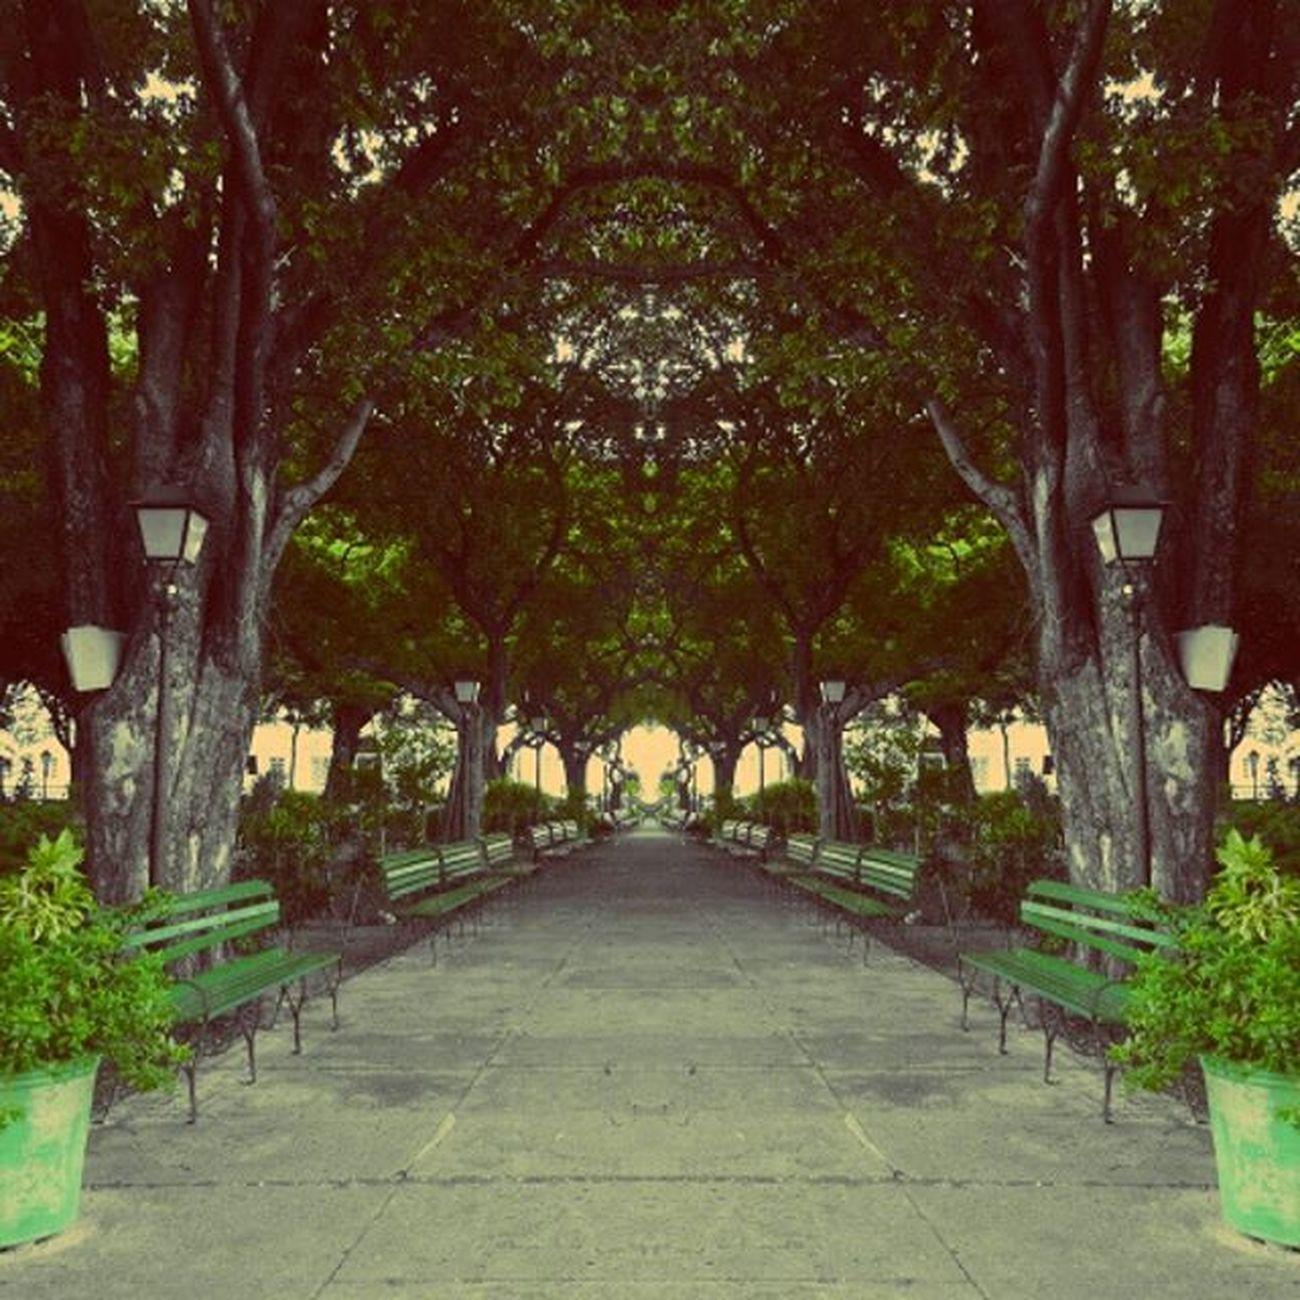 😄 Loosemag Looseart Photography Instagram Instagrambrasil Mirror Fotomissao Amigersbr Dnfotografia Urbanandstreet